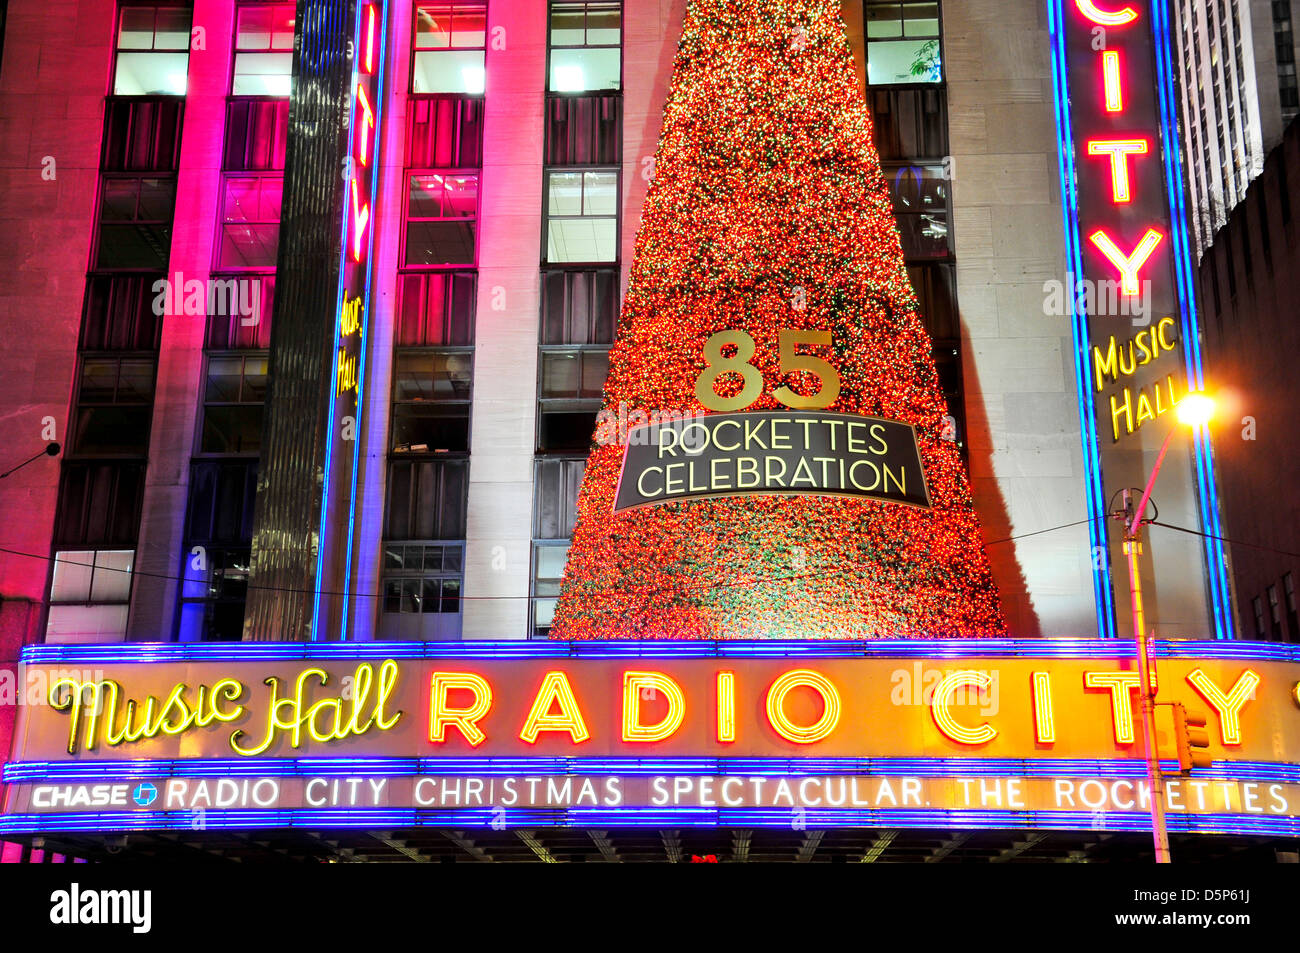 Radio City Music Hall Rockettes Stock Photos & Radio City Music Hall ...